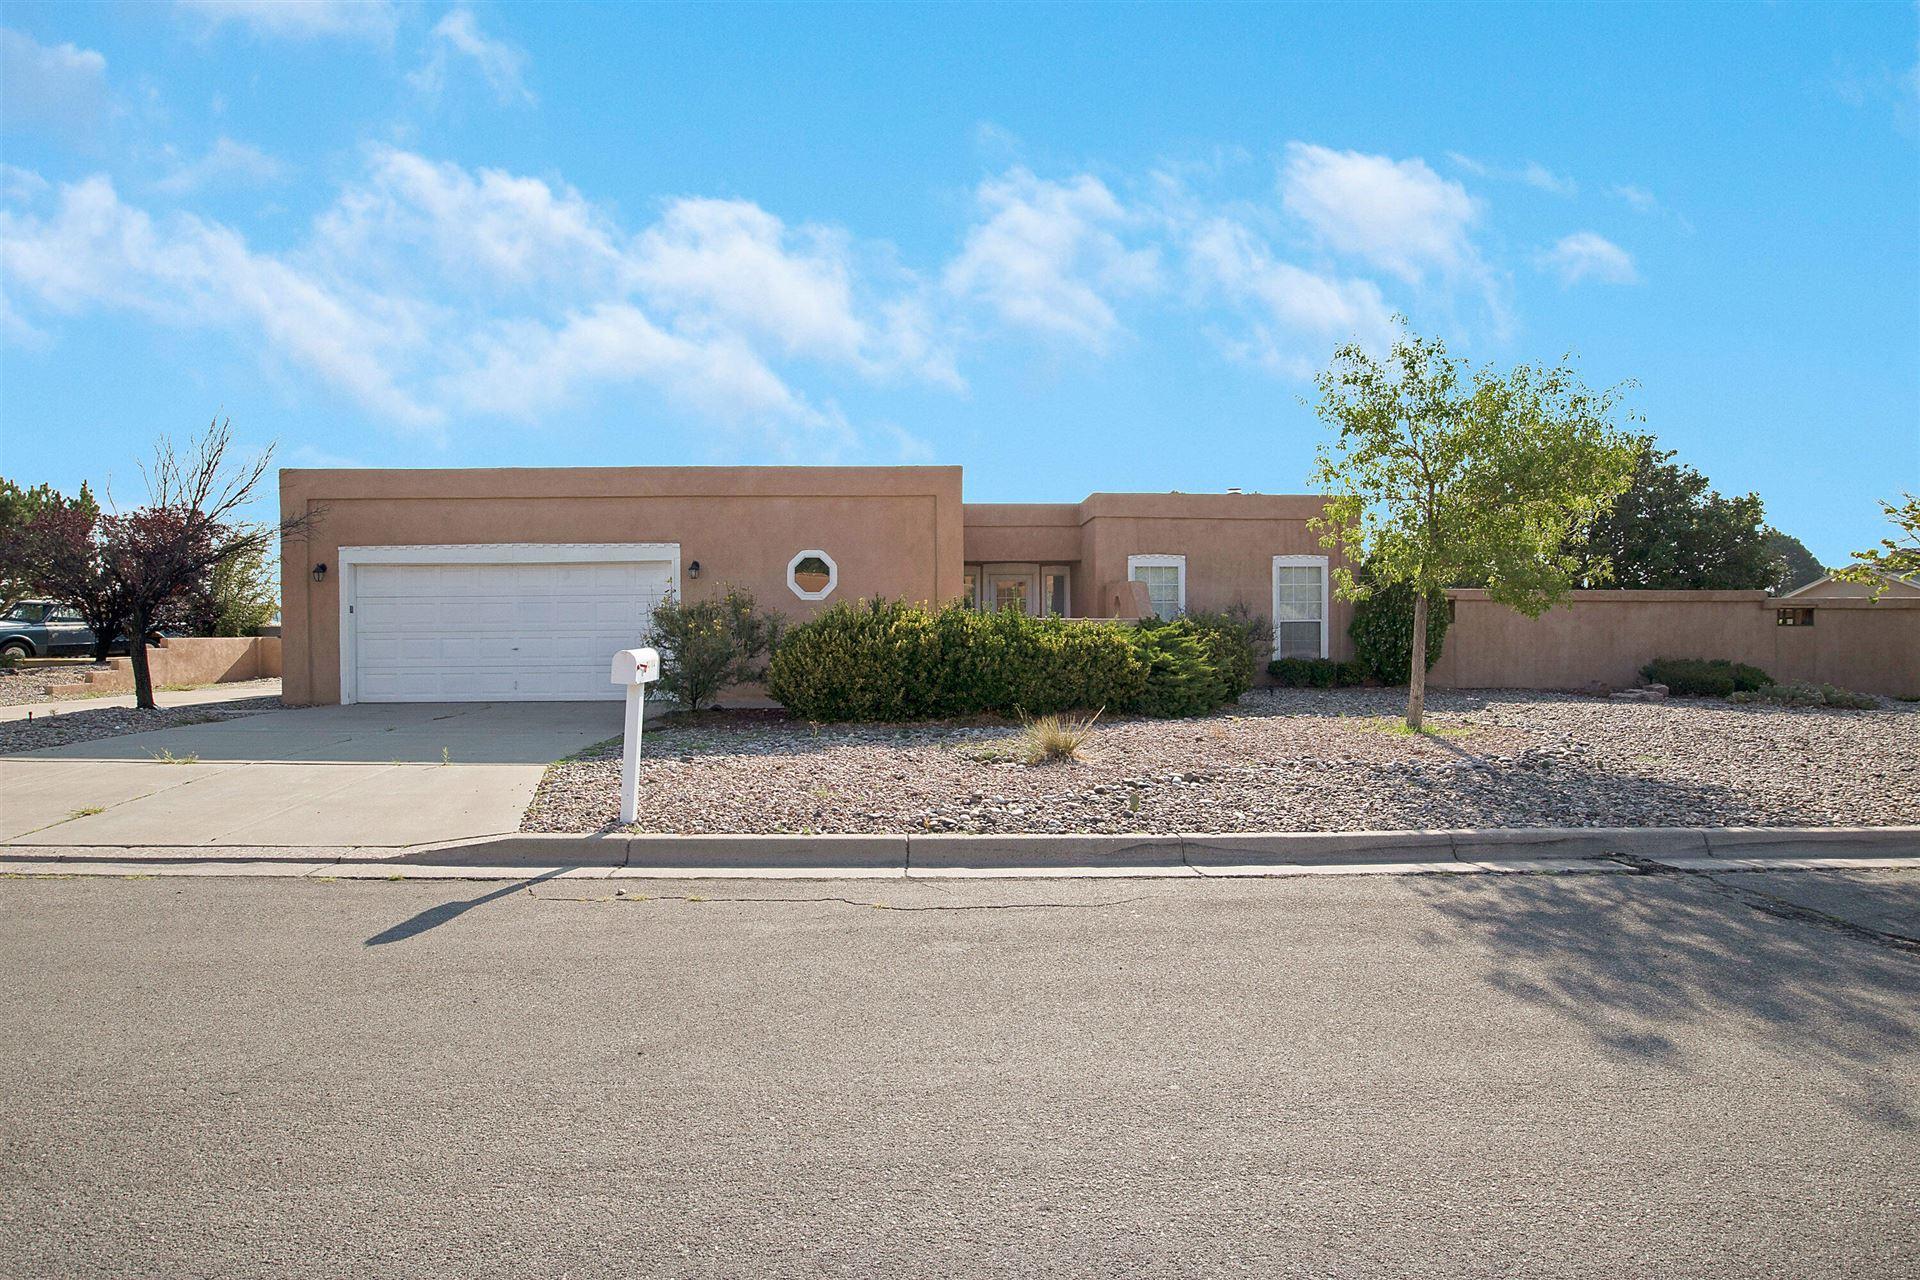 10300 TIMAN Place NW, Albuquerque, NM 87114 - #: 998480